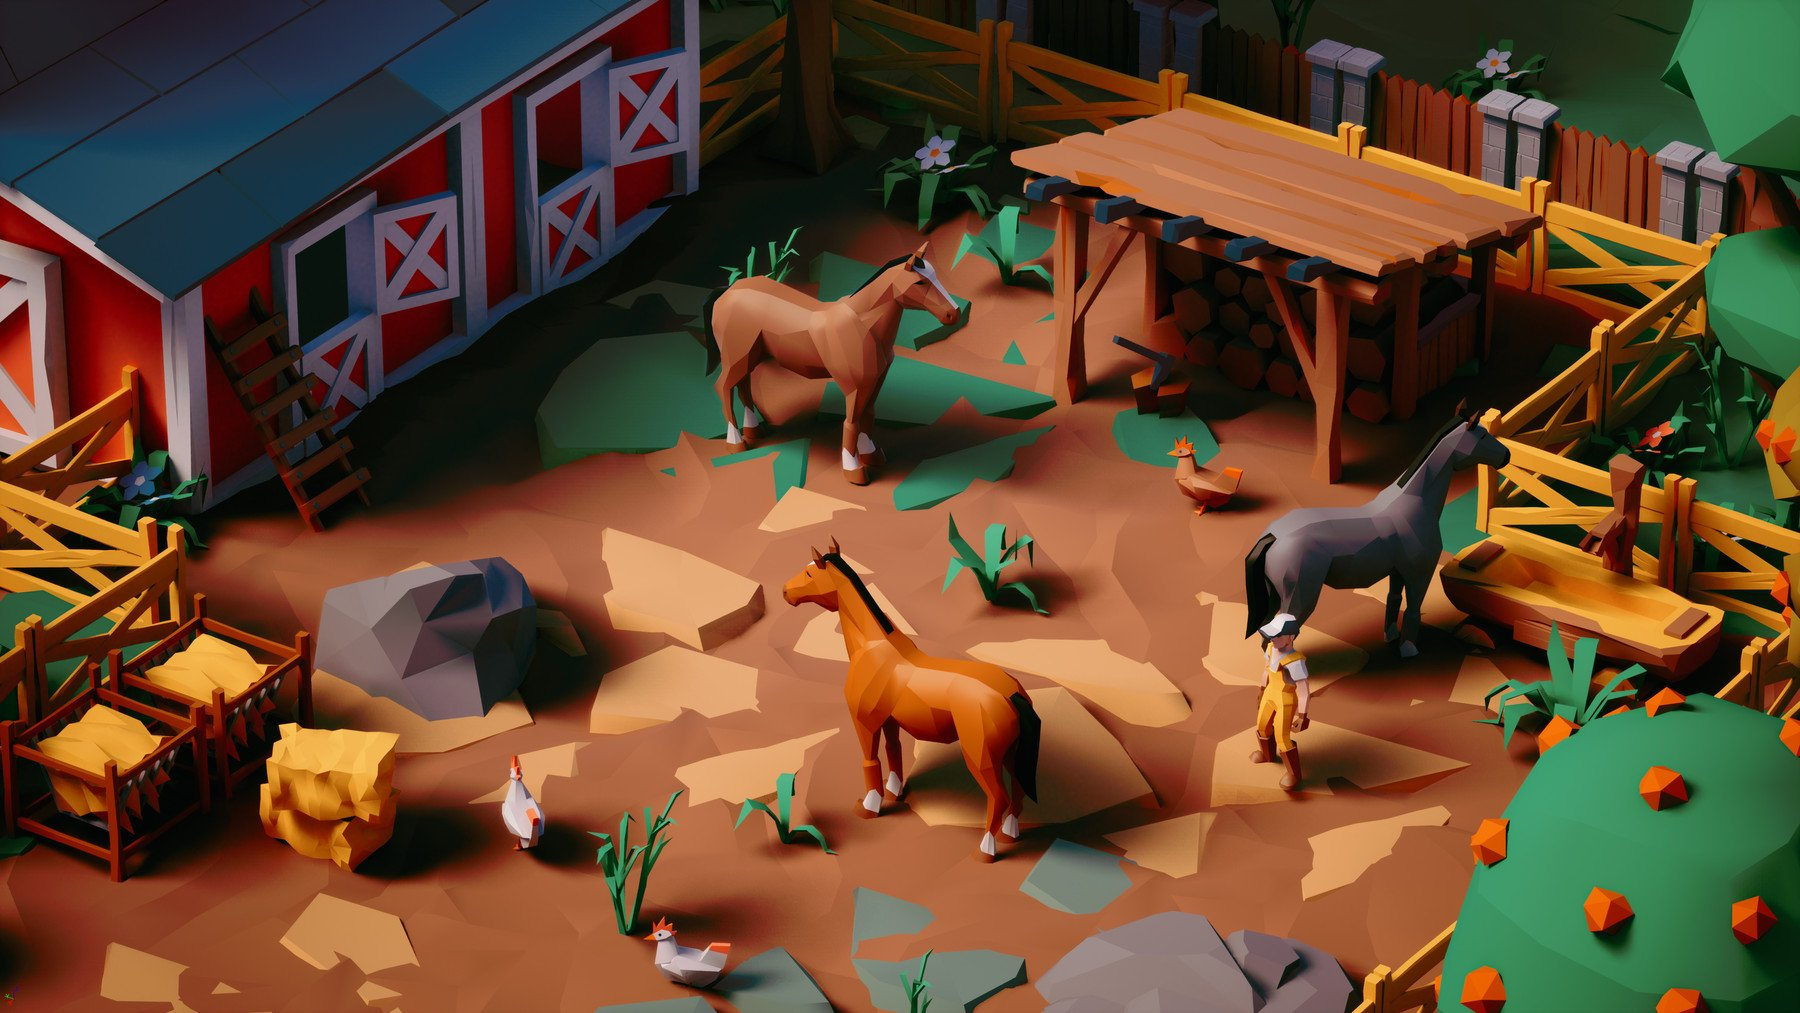 Farm Life - UE4, Unity3D, FBX Stylized LowPoly Art Package